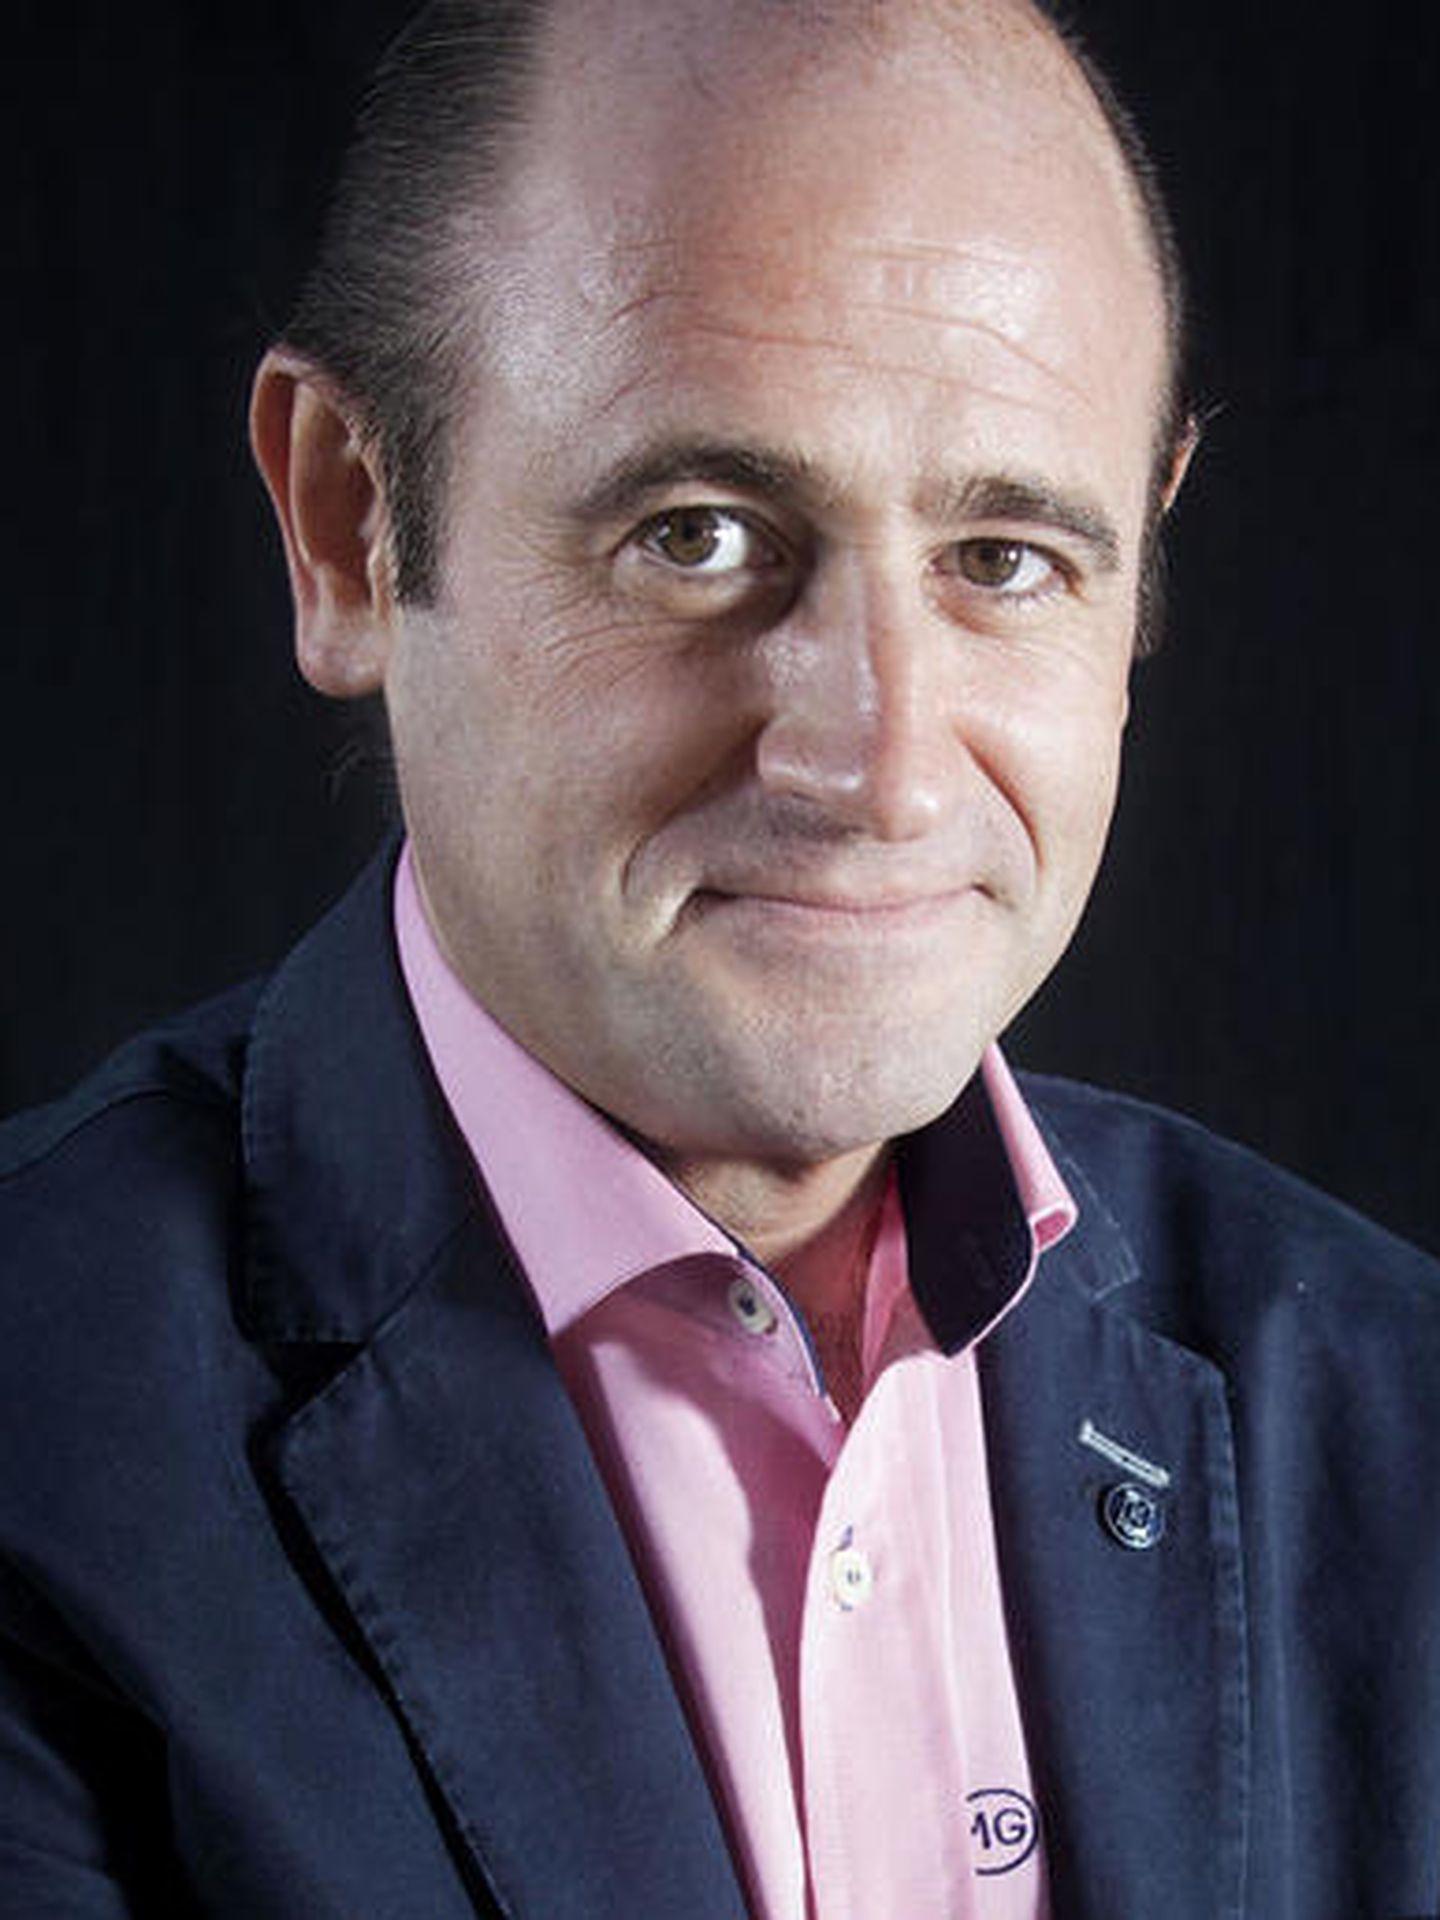 Fermín J. Urbiola